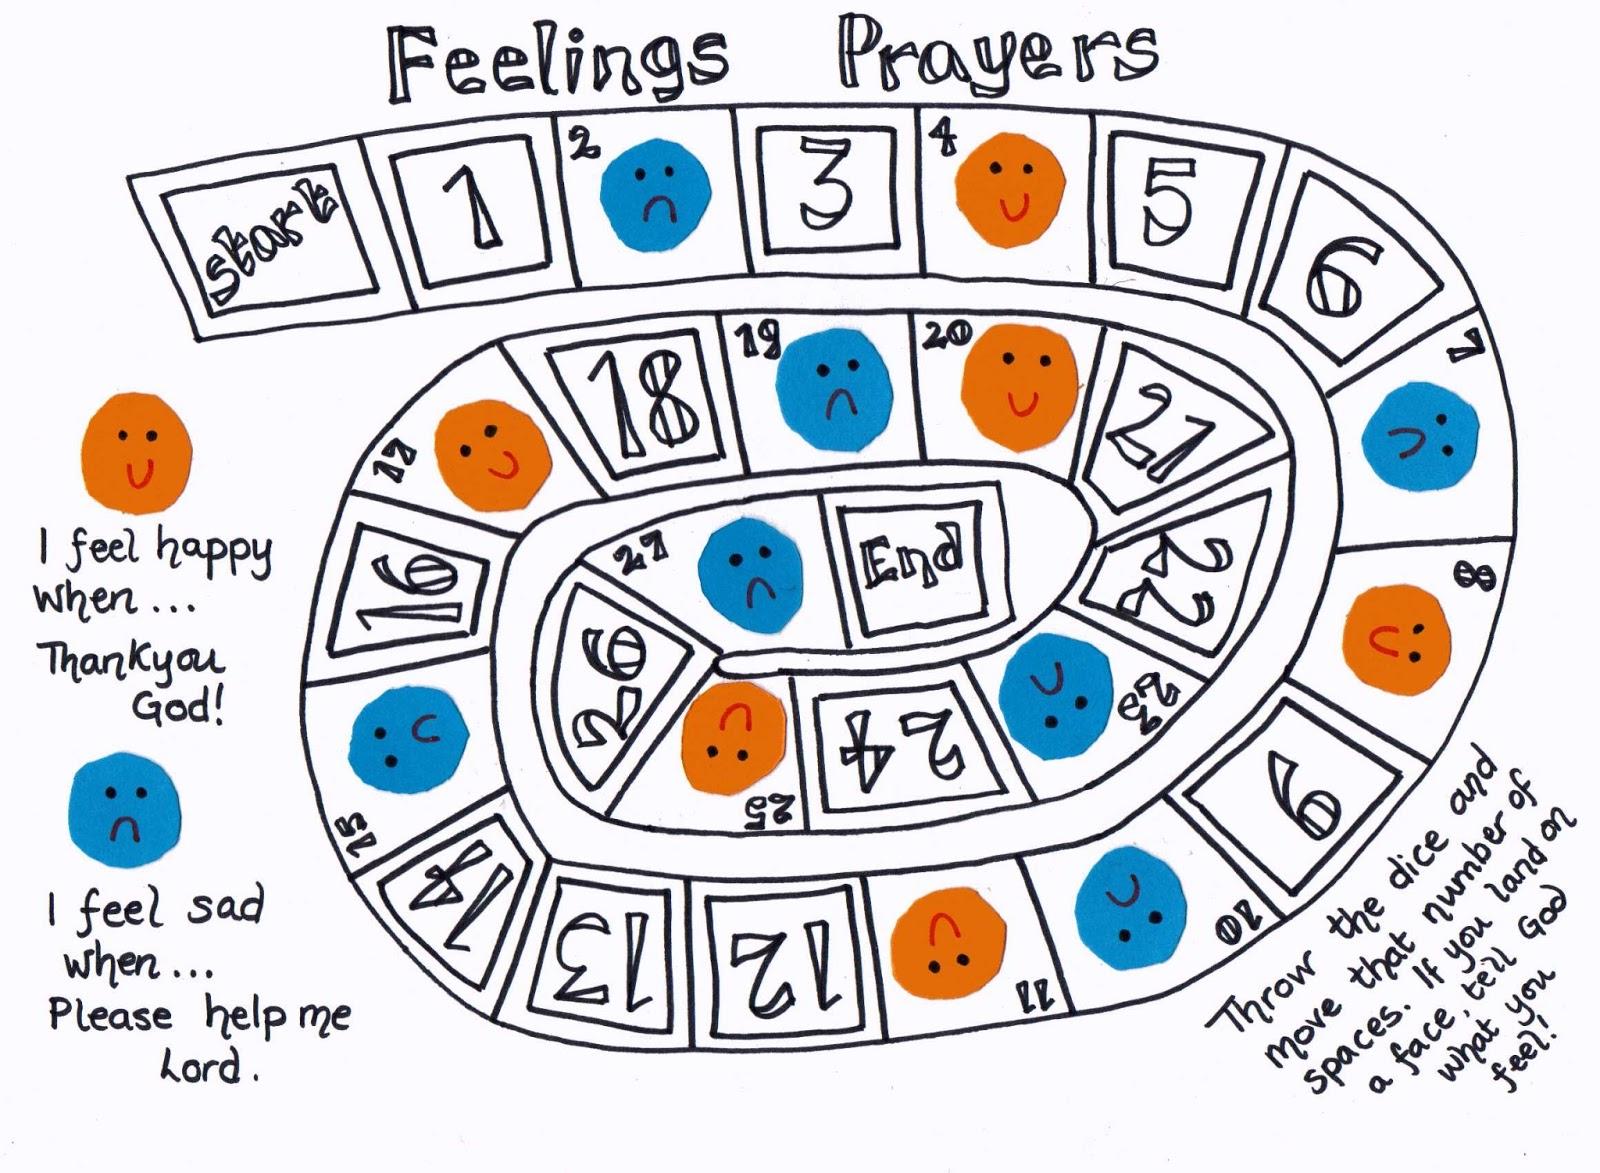 Flame Creative Children S Ministry Feelings Prayer Game